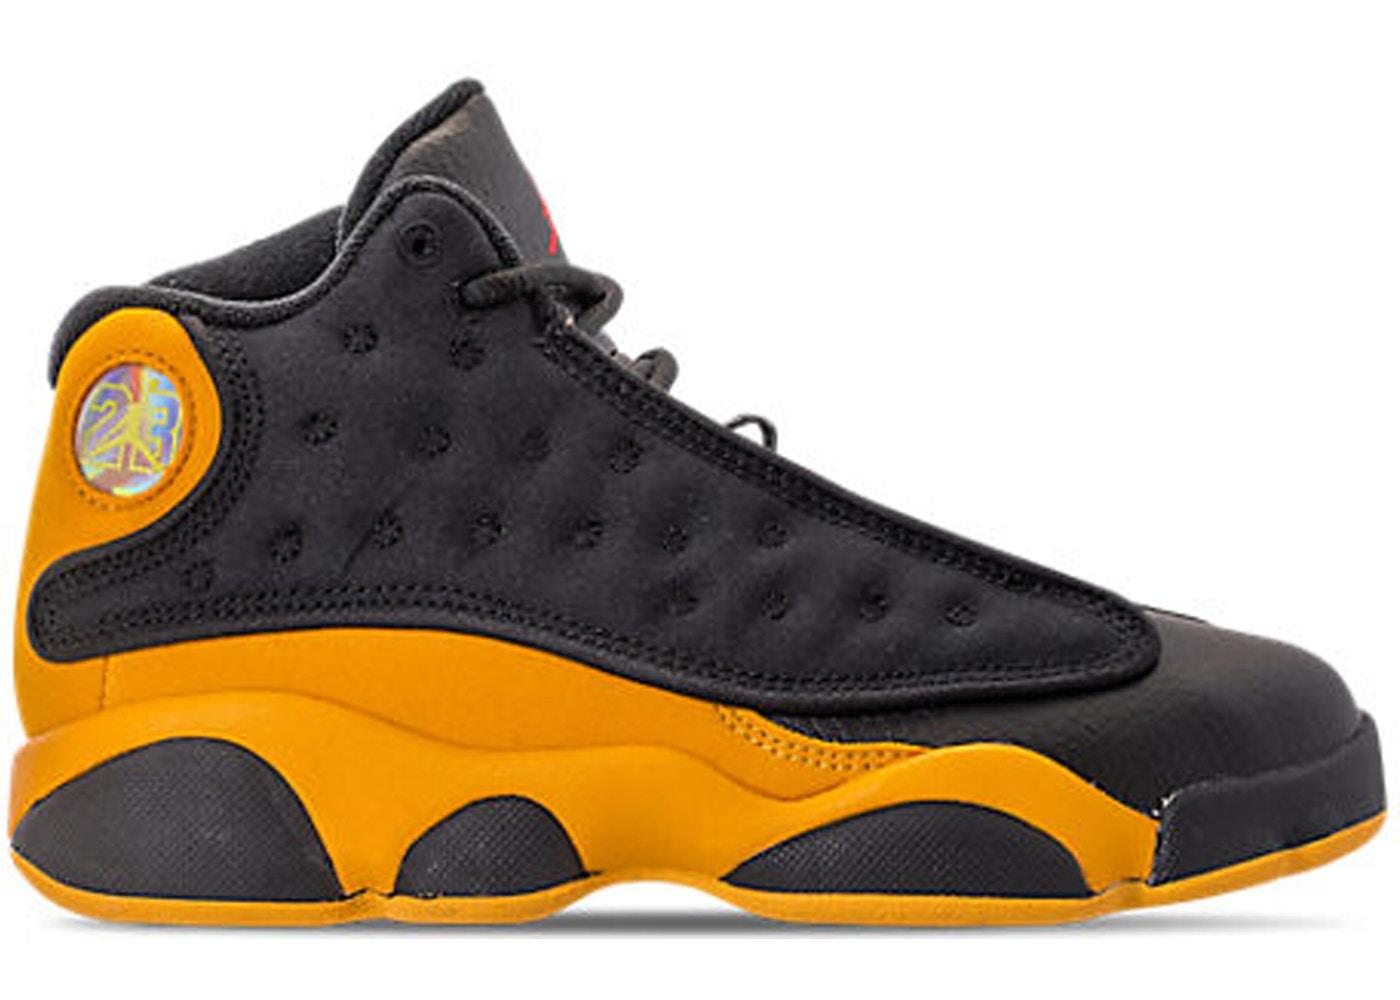 3423b38c0858 Jordan 13 Retro Carmelo Anthony Class Of 2002 (PS) - 414575-035